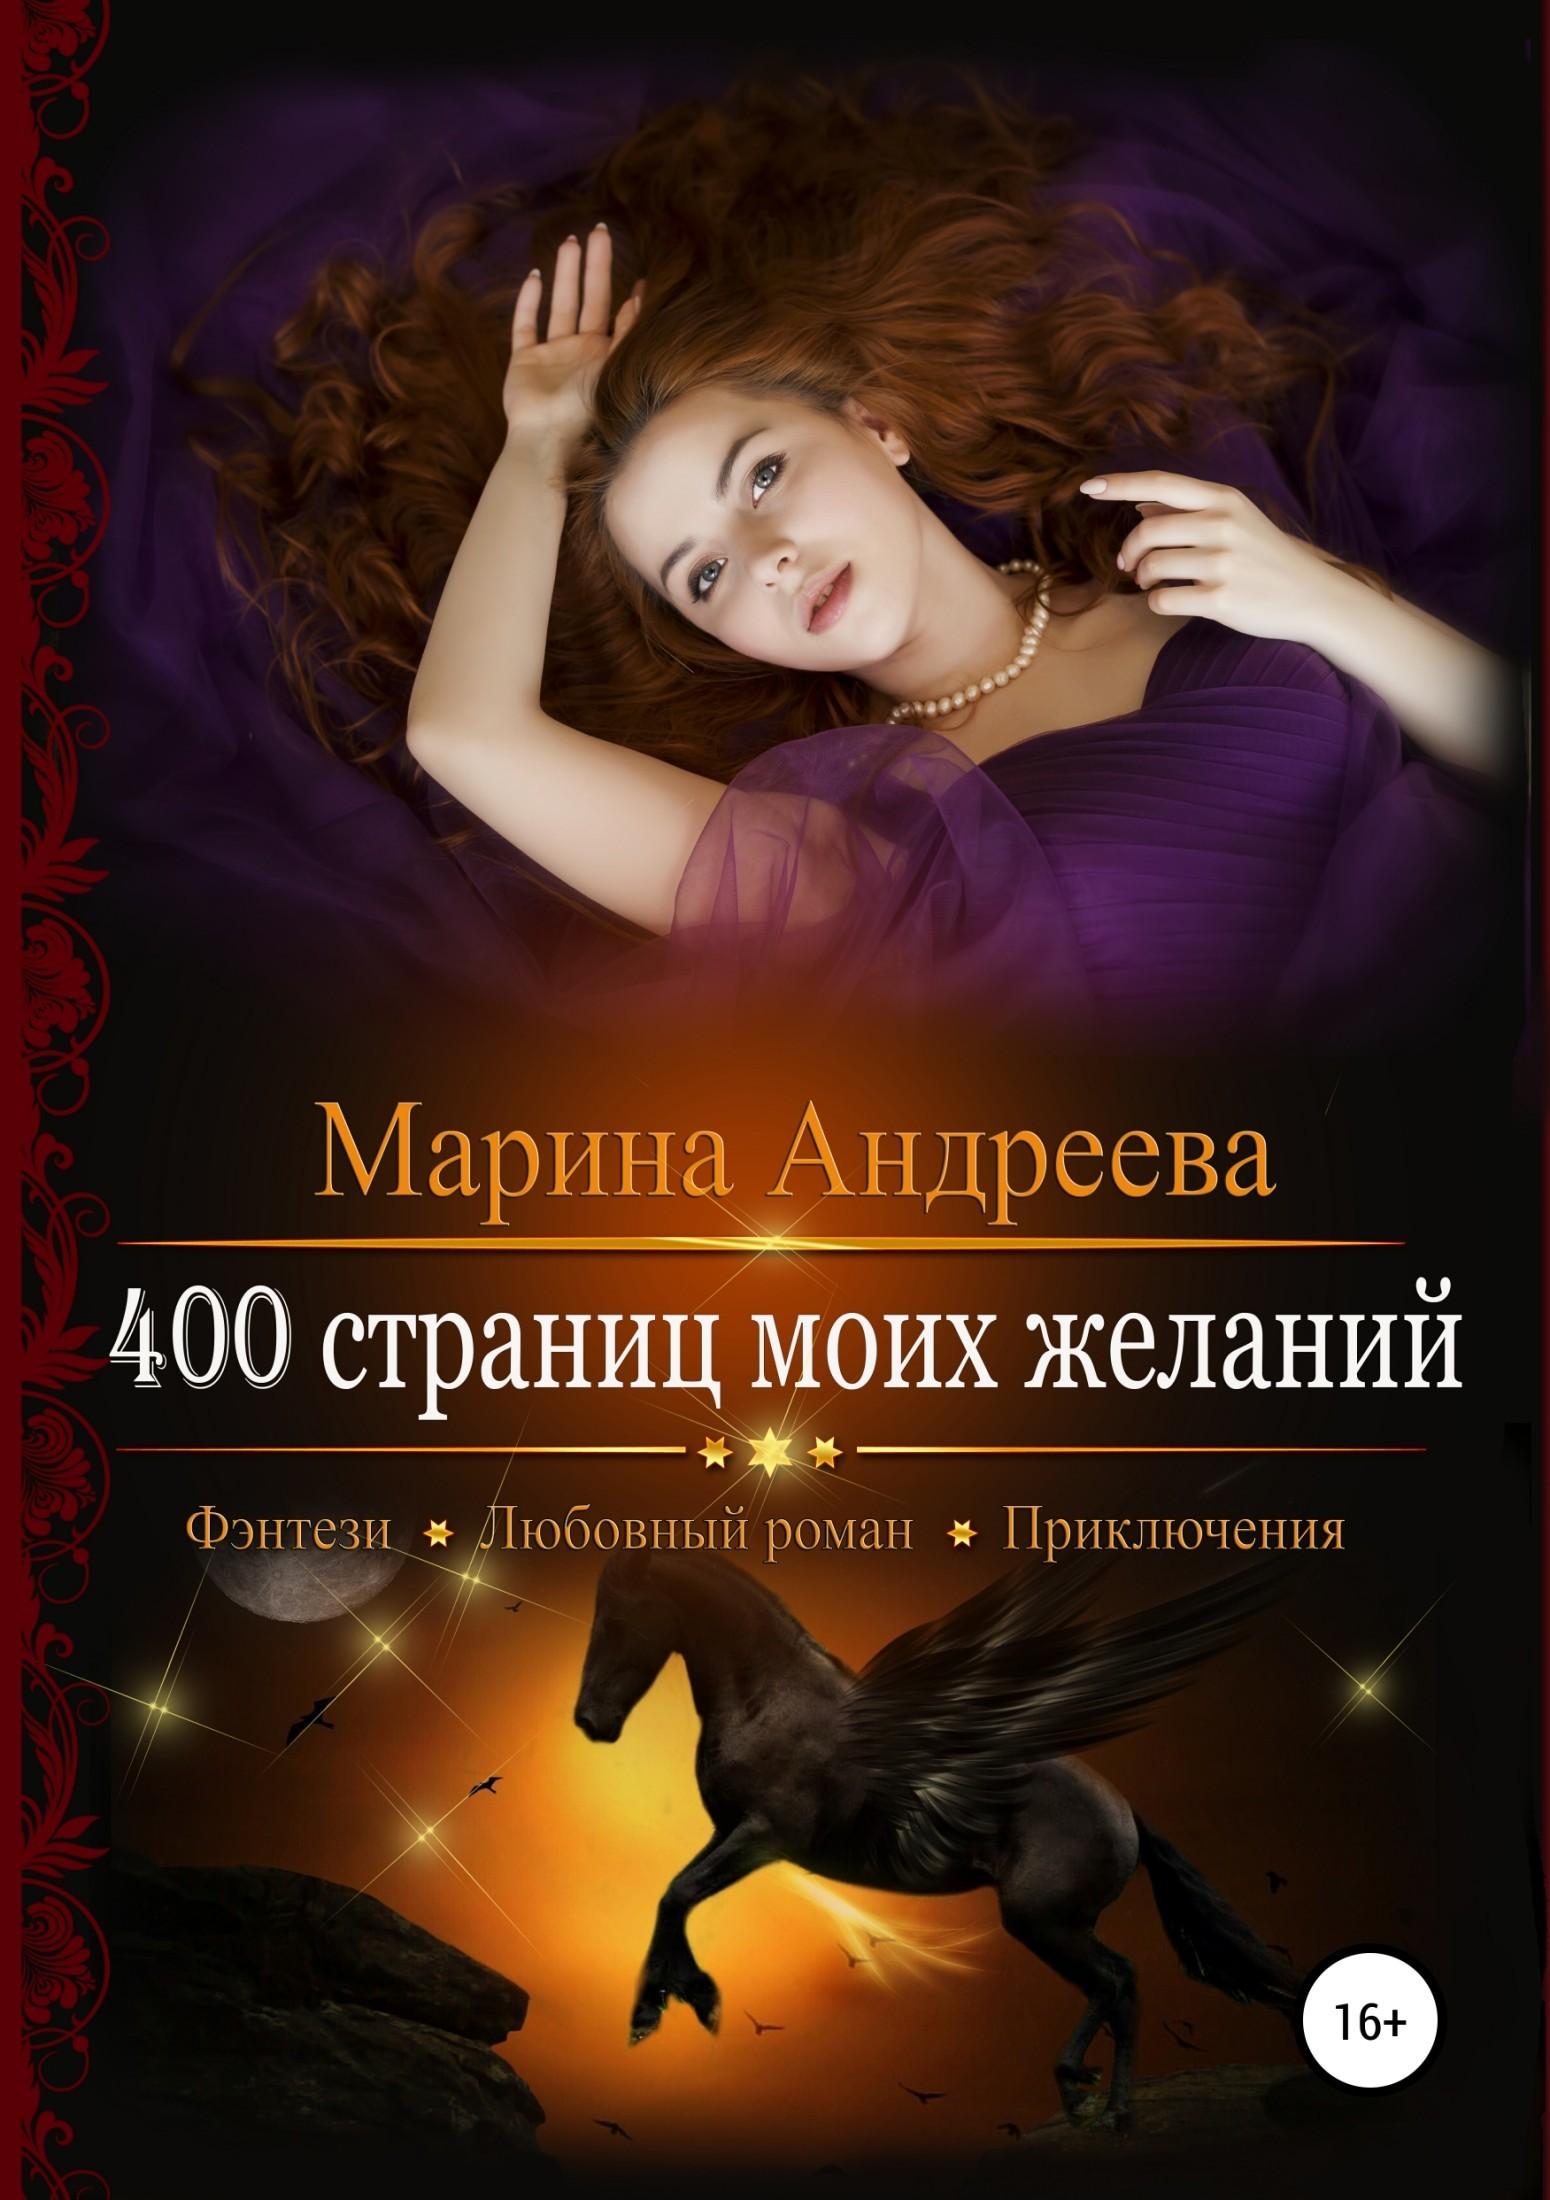 Марина Андреева 400 страниц моих желаний андреева м 400 страниц моих надежд роман